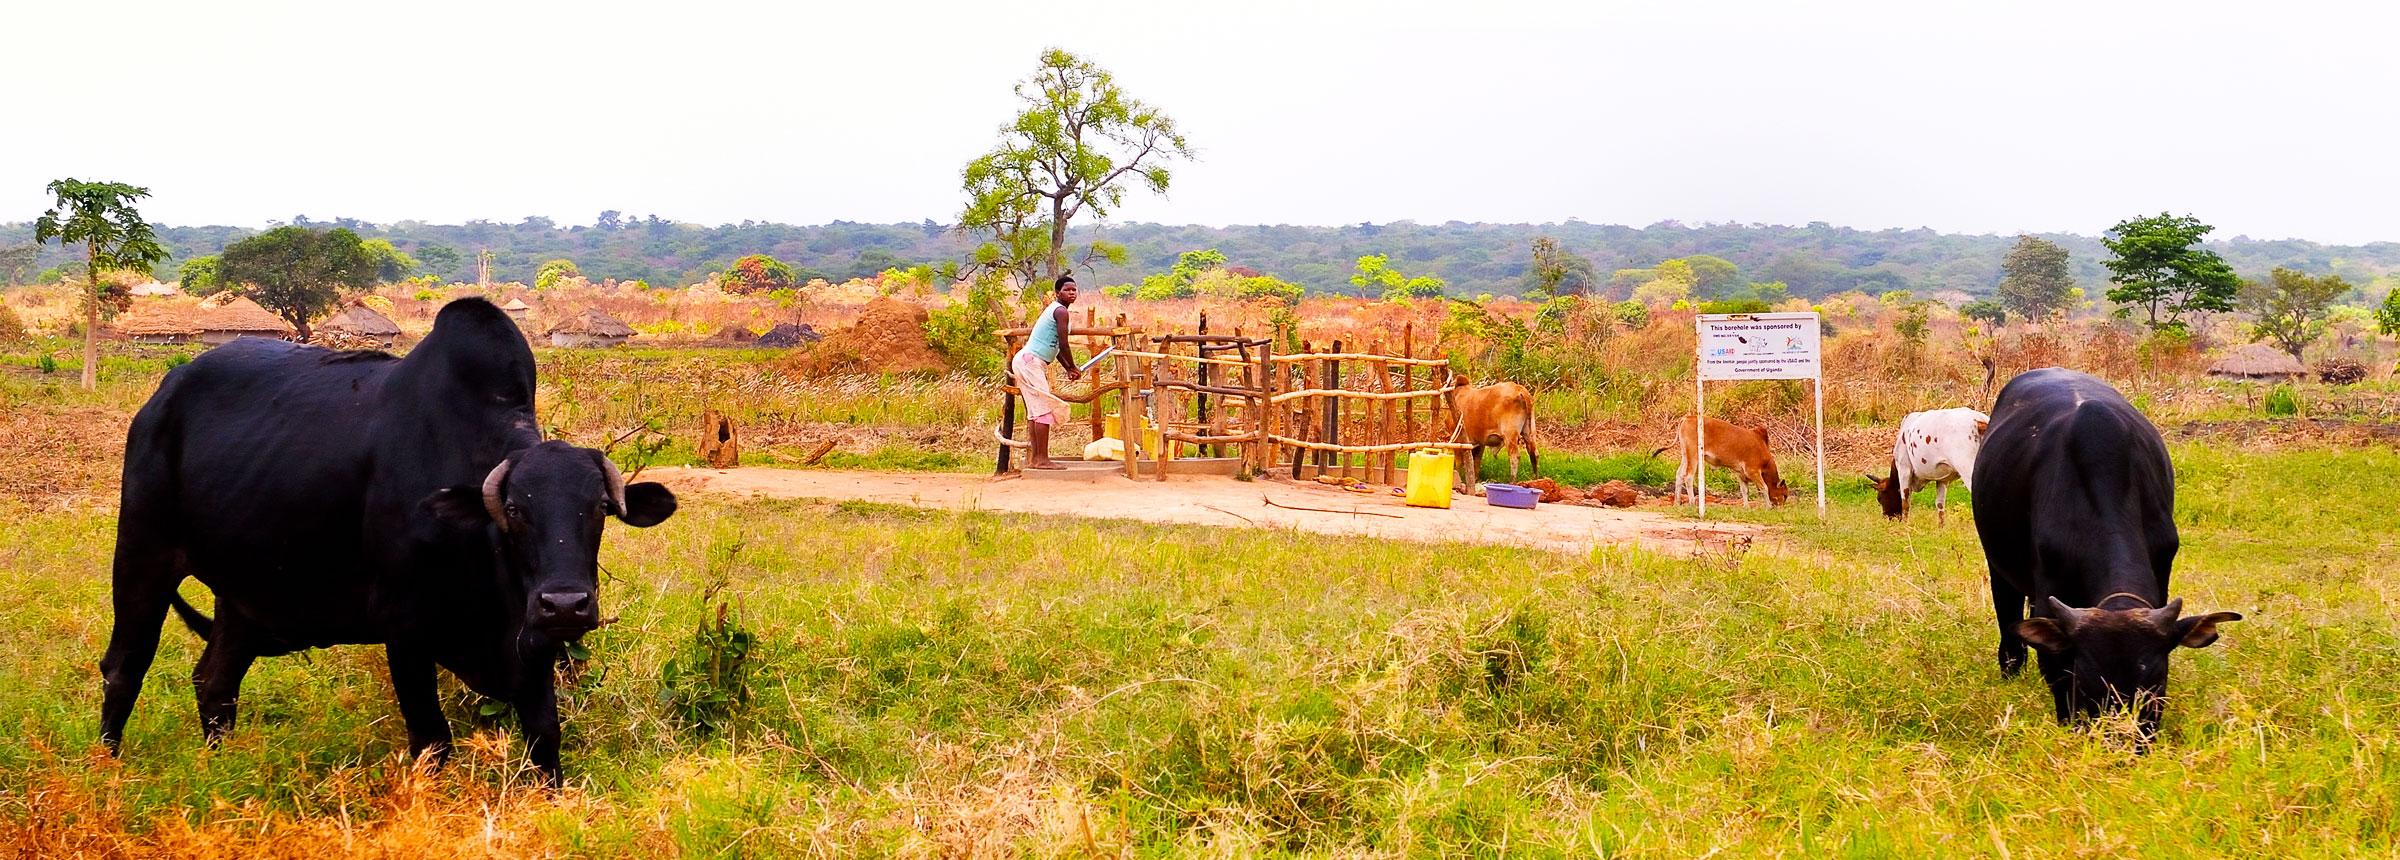 Ugandan woman drawing water at well